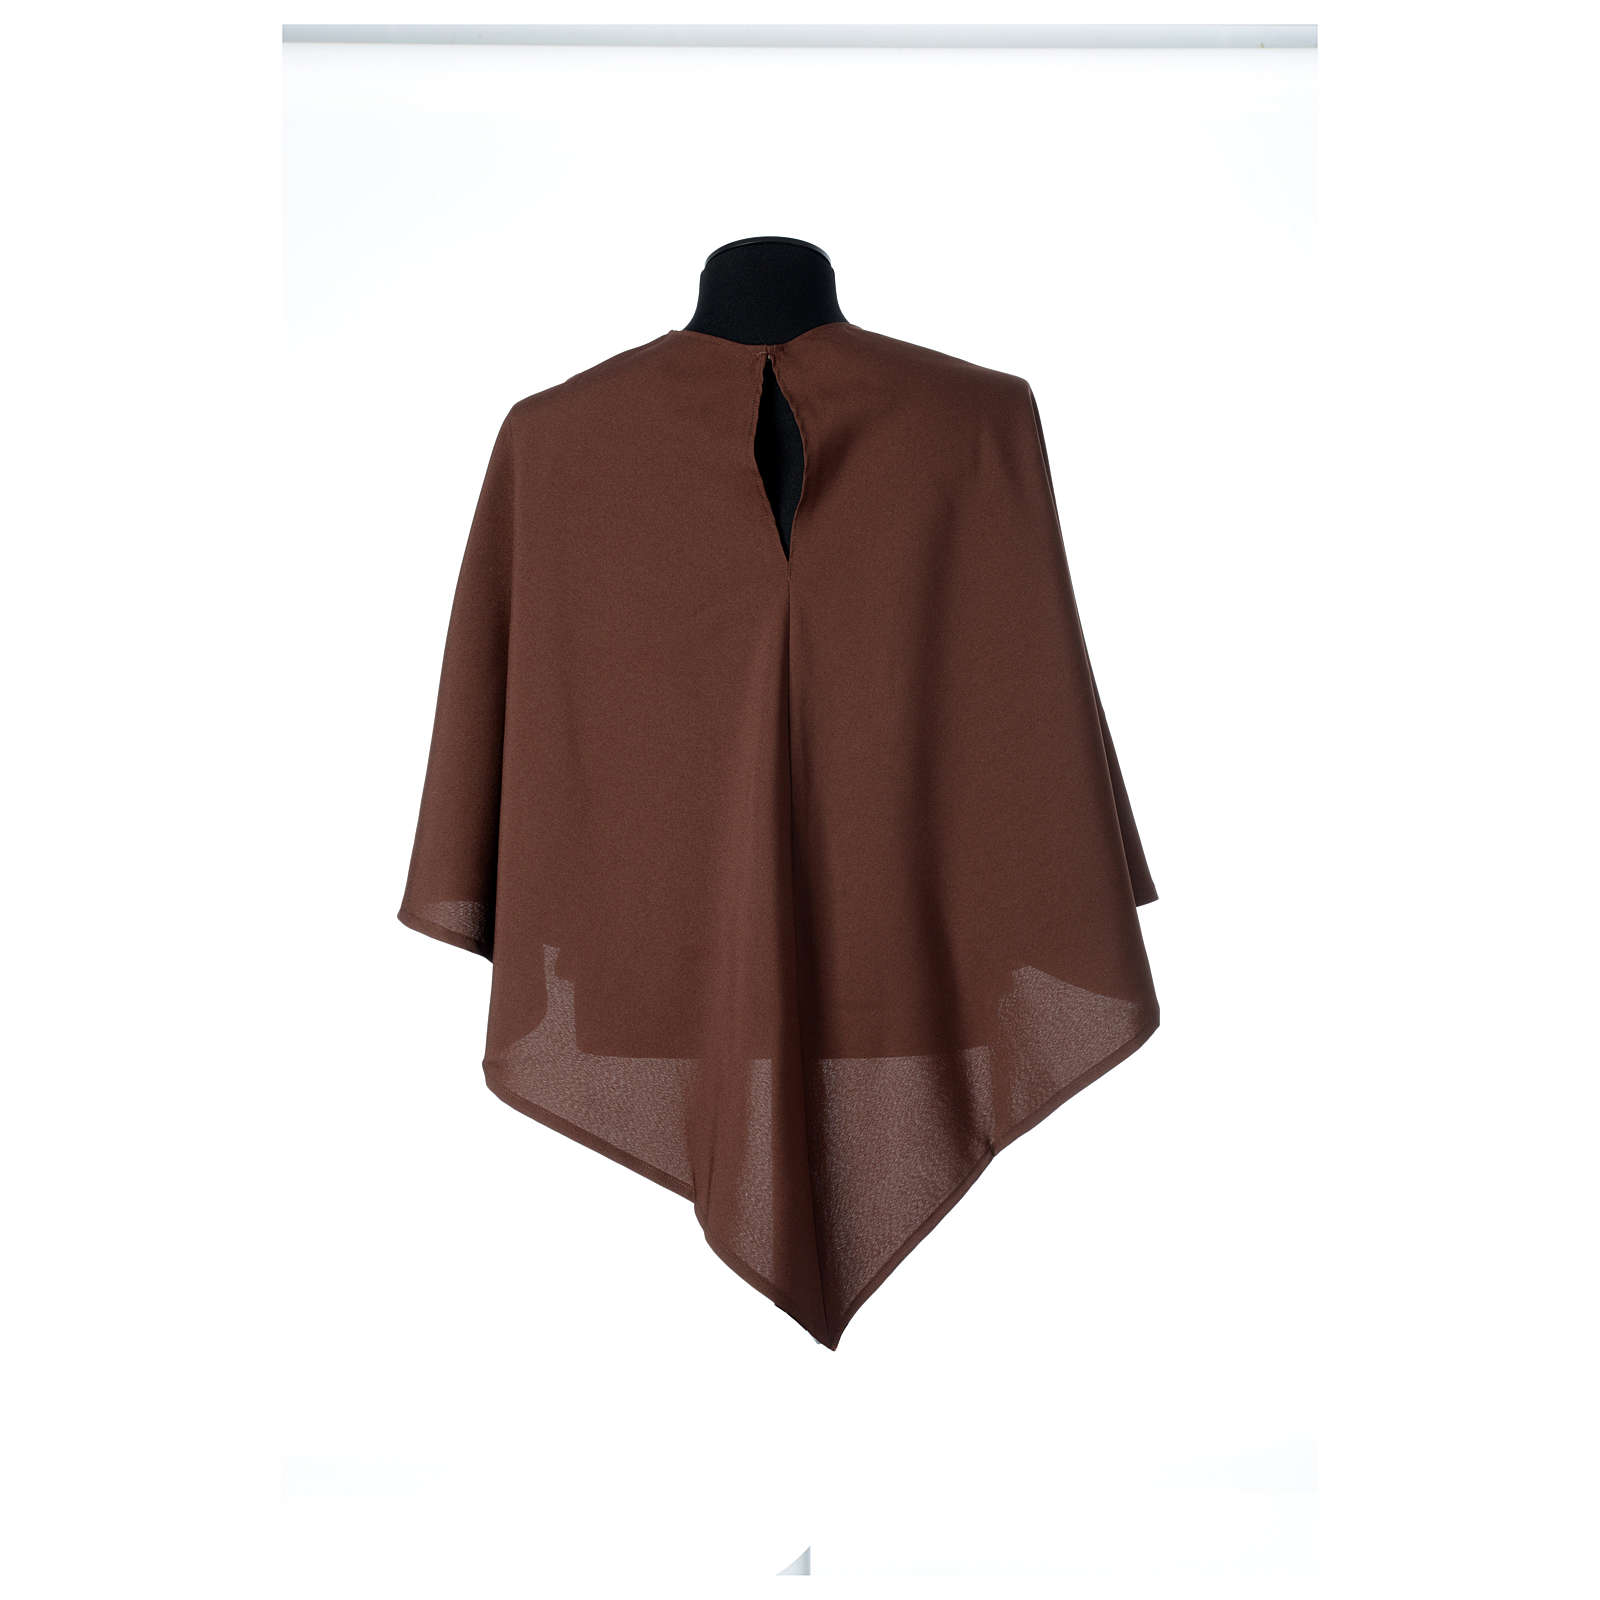 Hábito franciscano capucha marrón poliéster 4